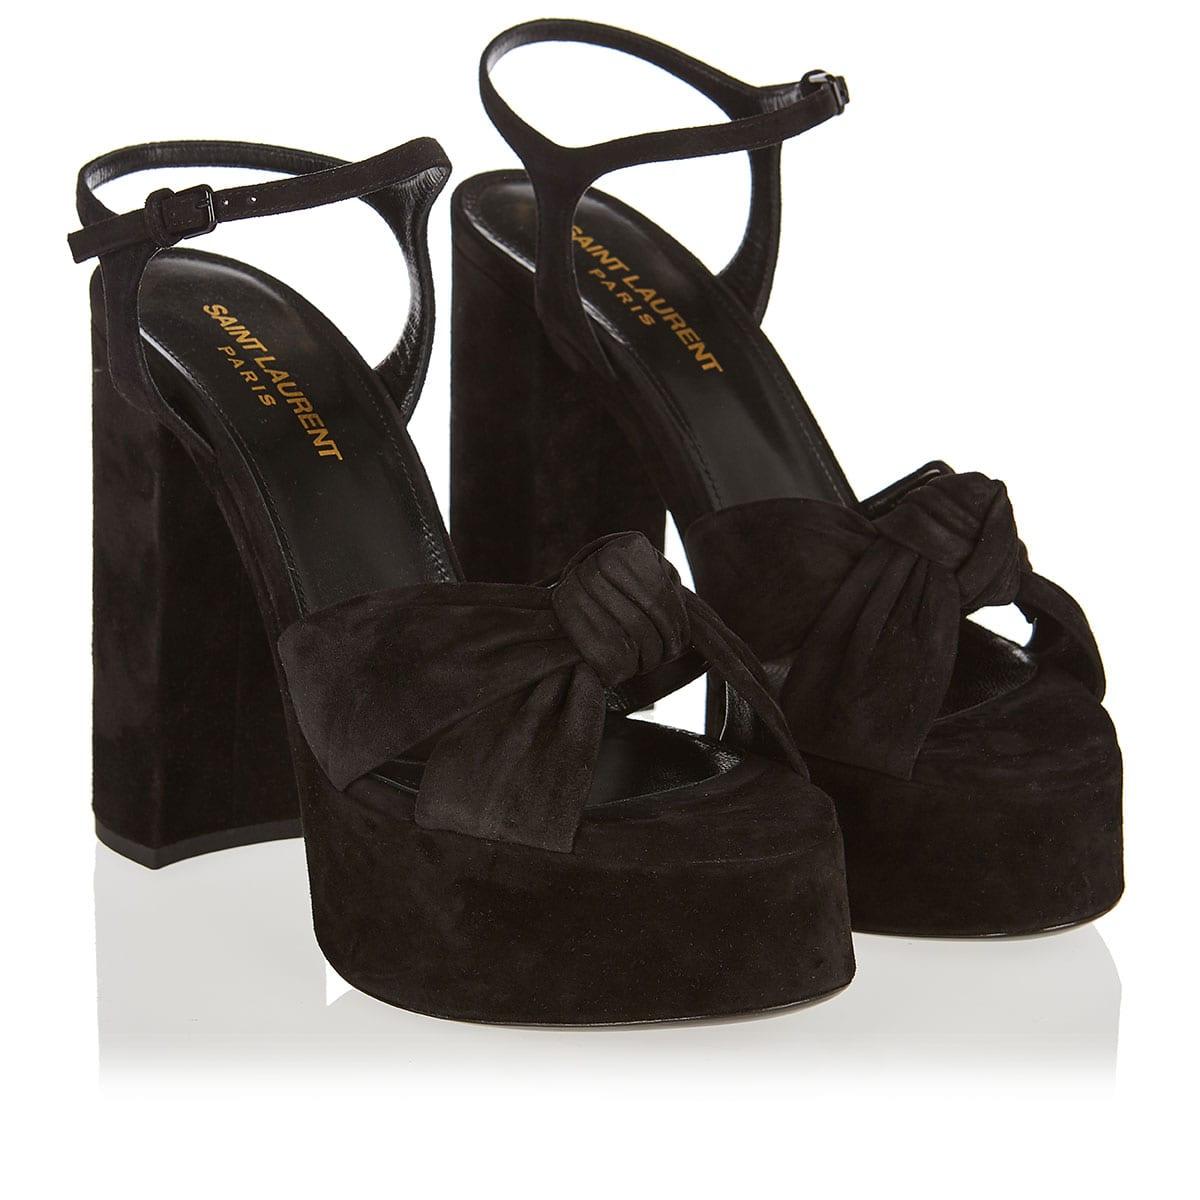 Bianca suede platform sandals